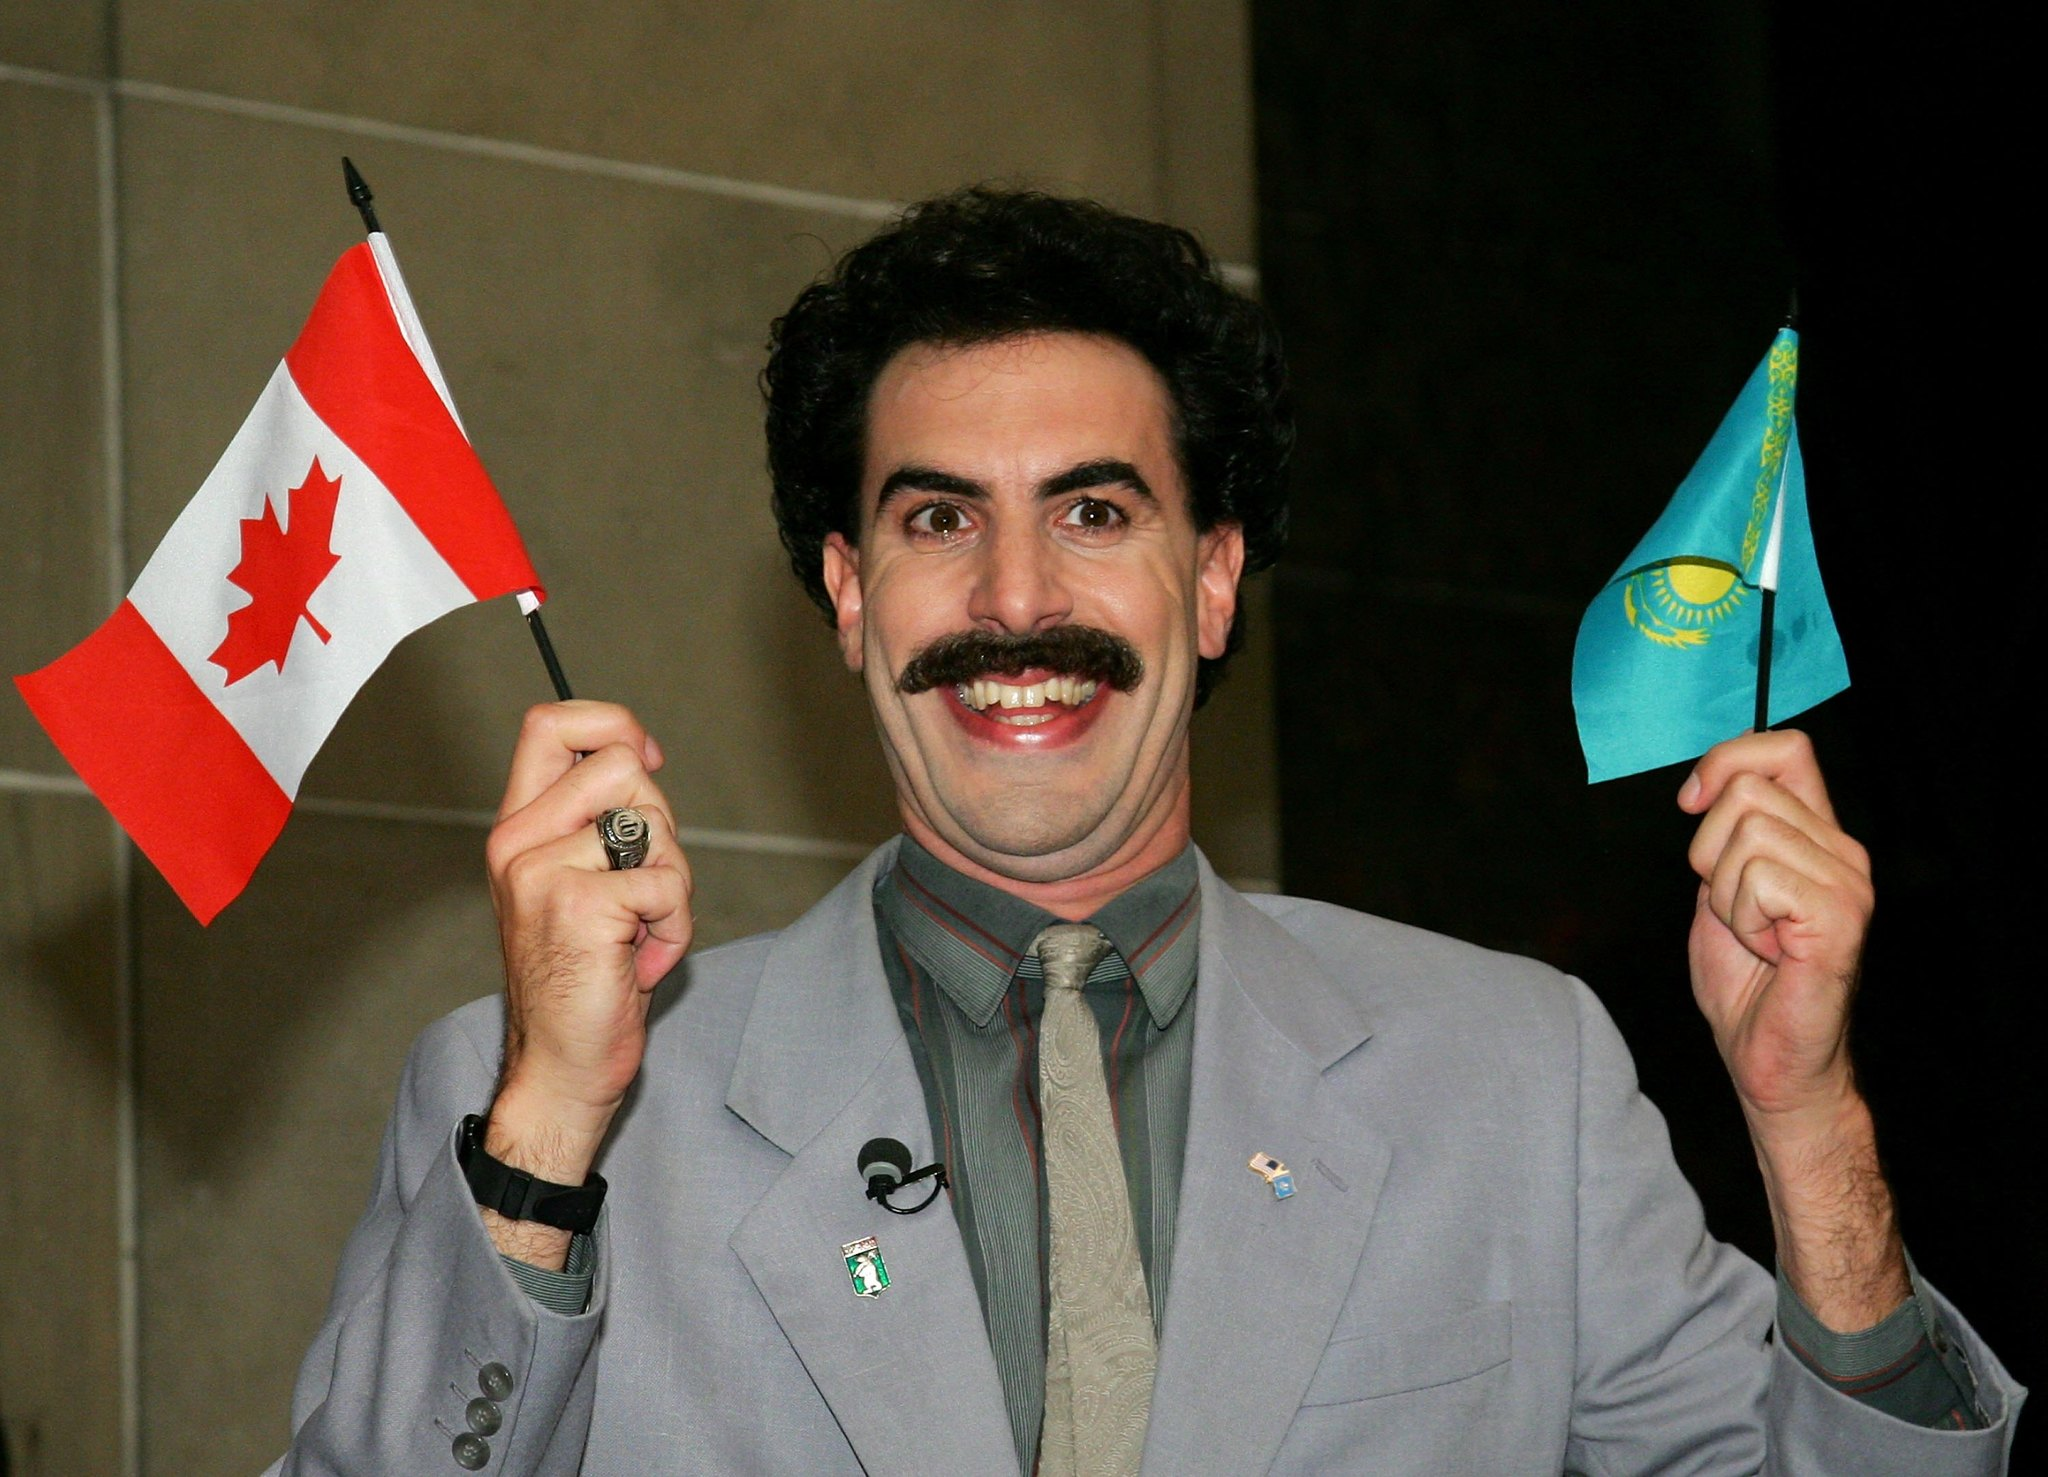 Borat Cultural Learnings Of America For Make Benefit Glorious Nation Of Kazakhstan 2006